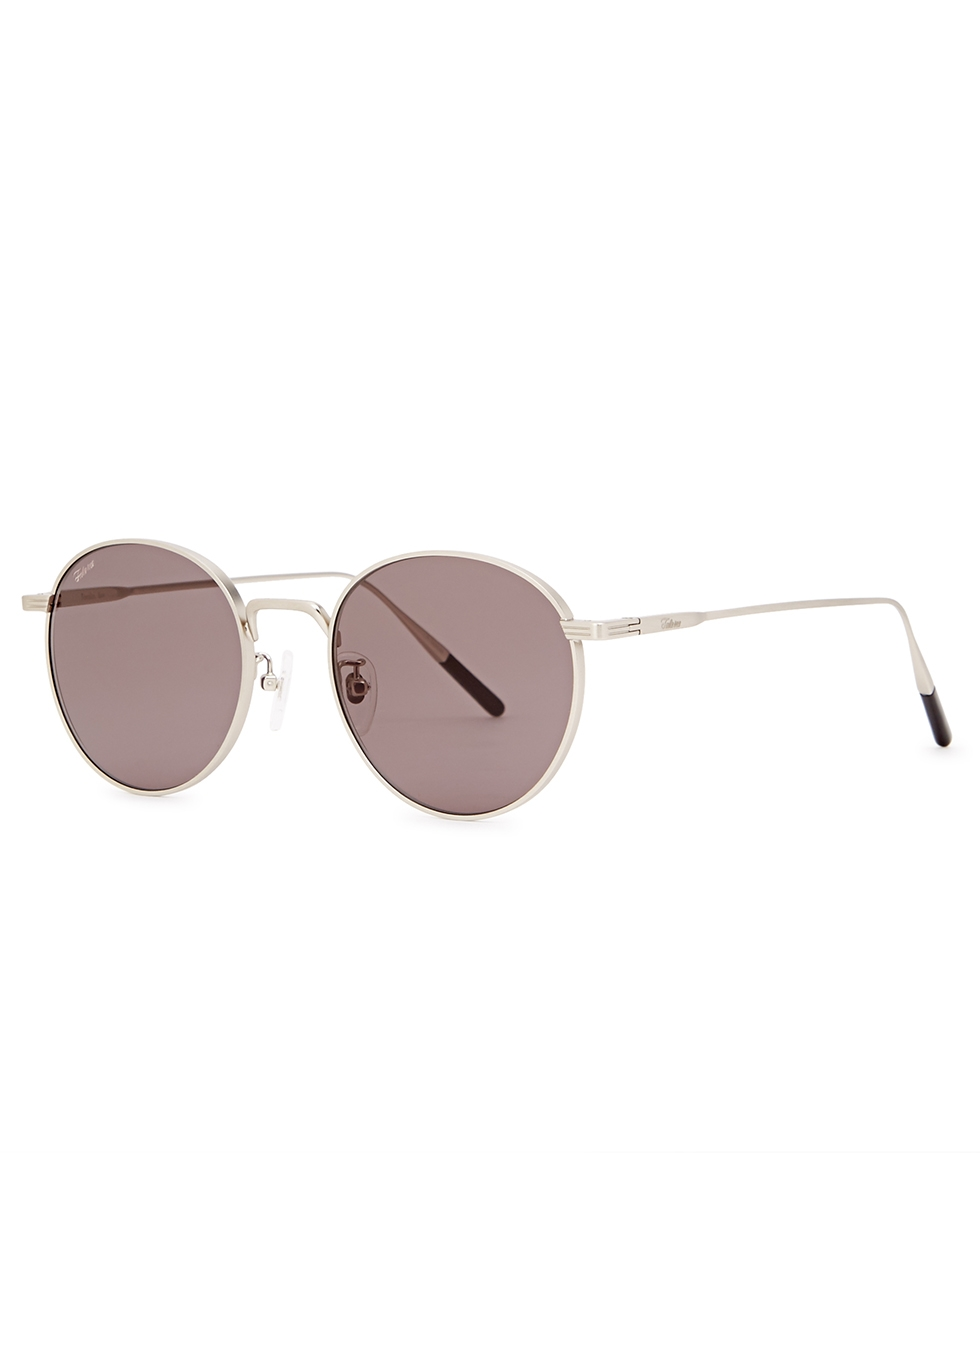 Toolin round-frame sunglasses - FAKE ME